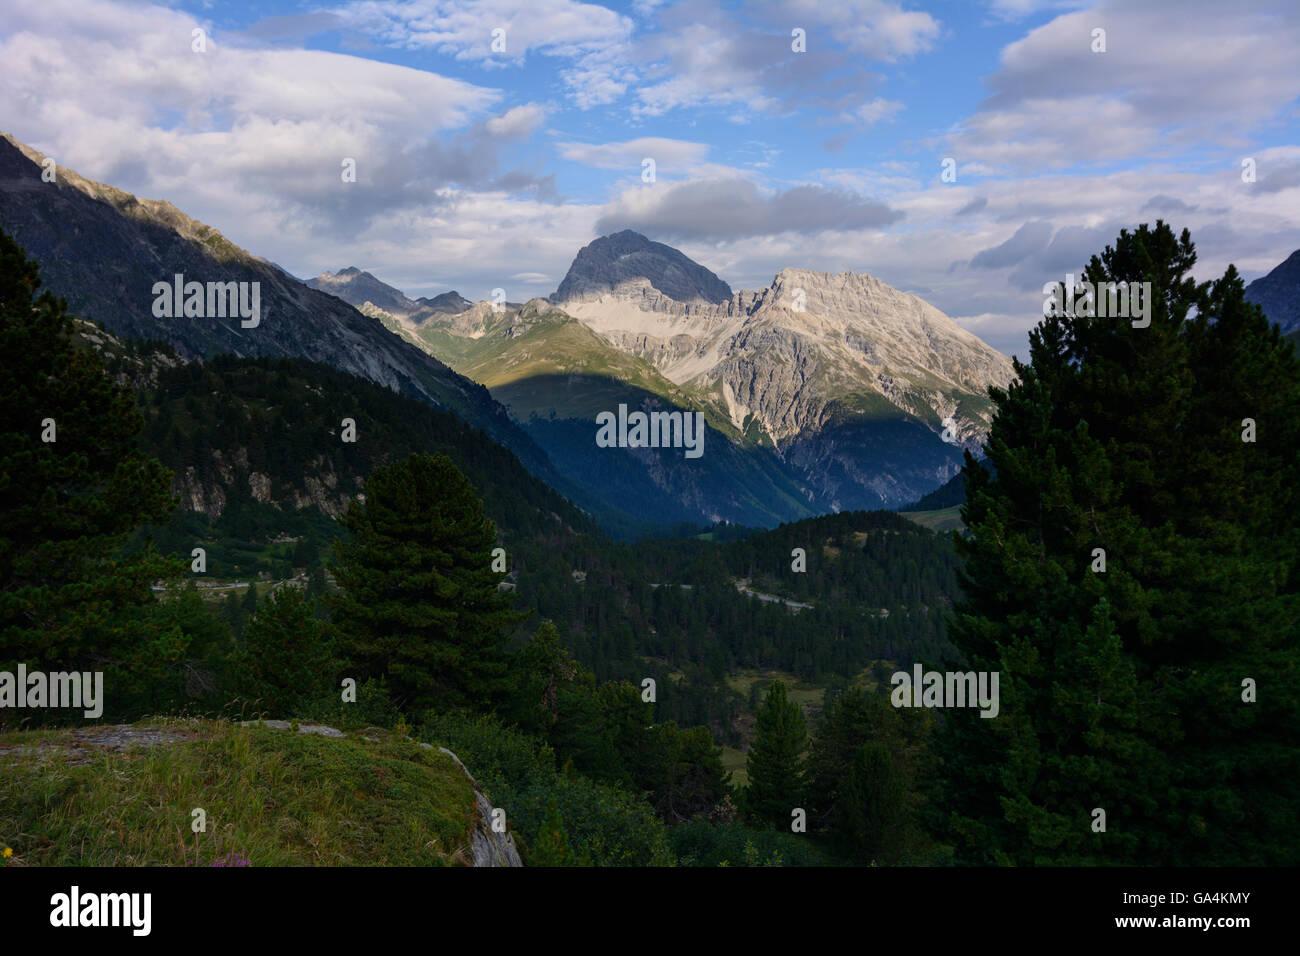 Preda View from Albula pass into Albula valley Switzerland Graubünden, Grisons Albula - Stock Image